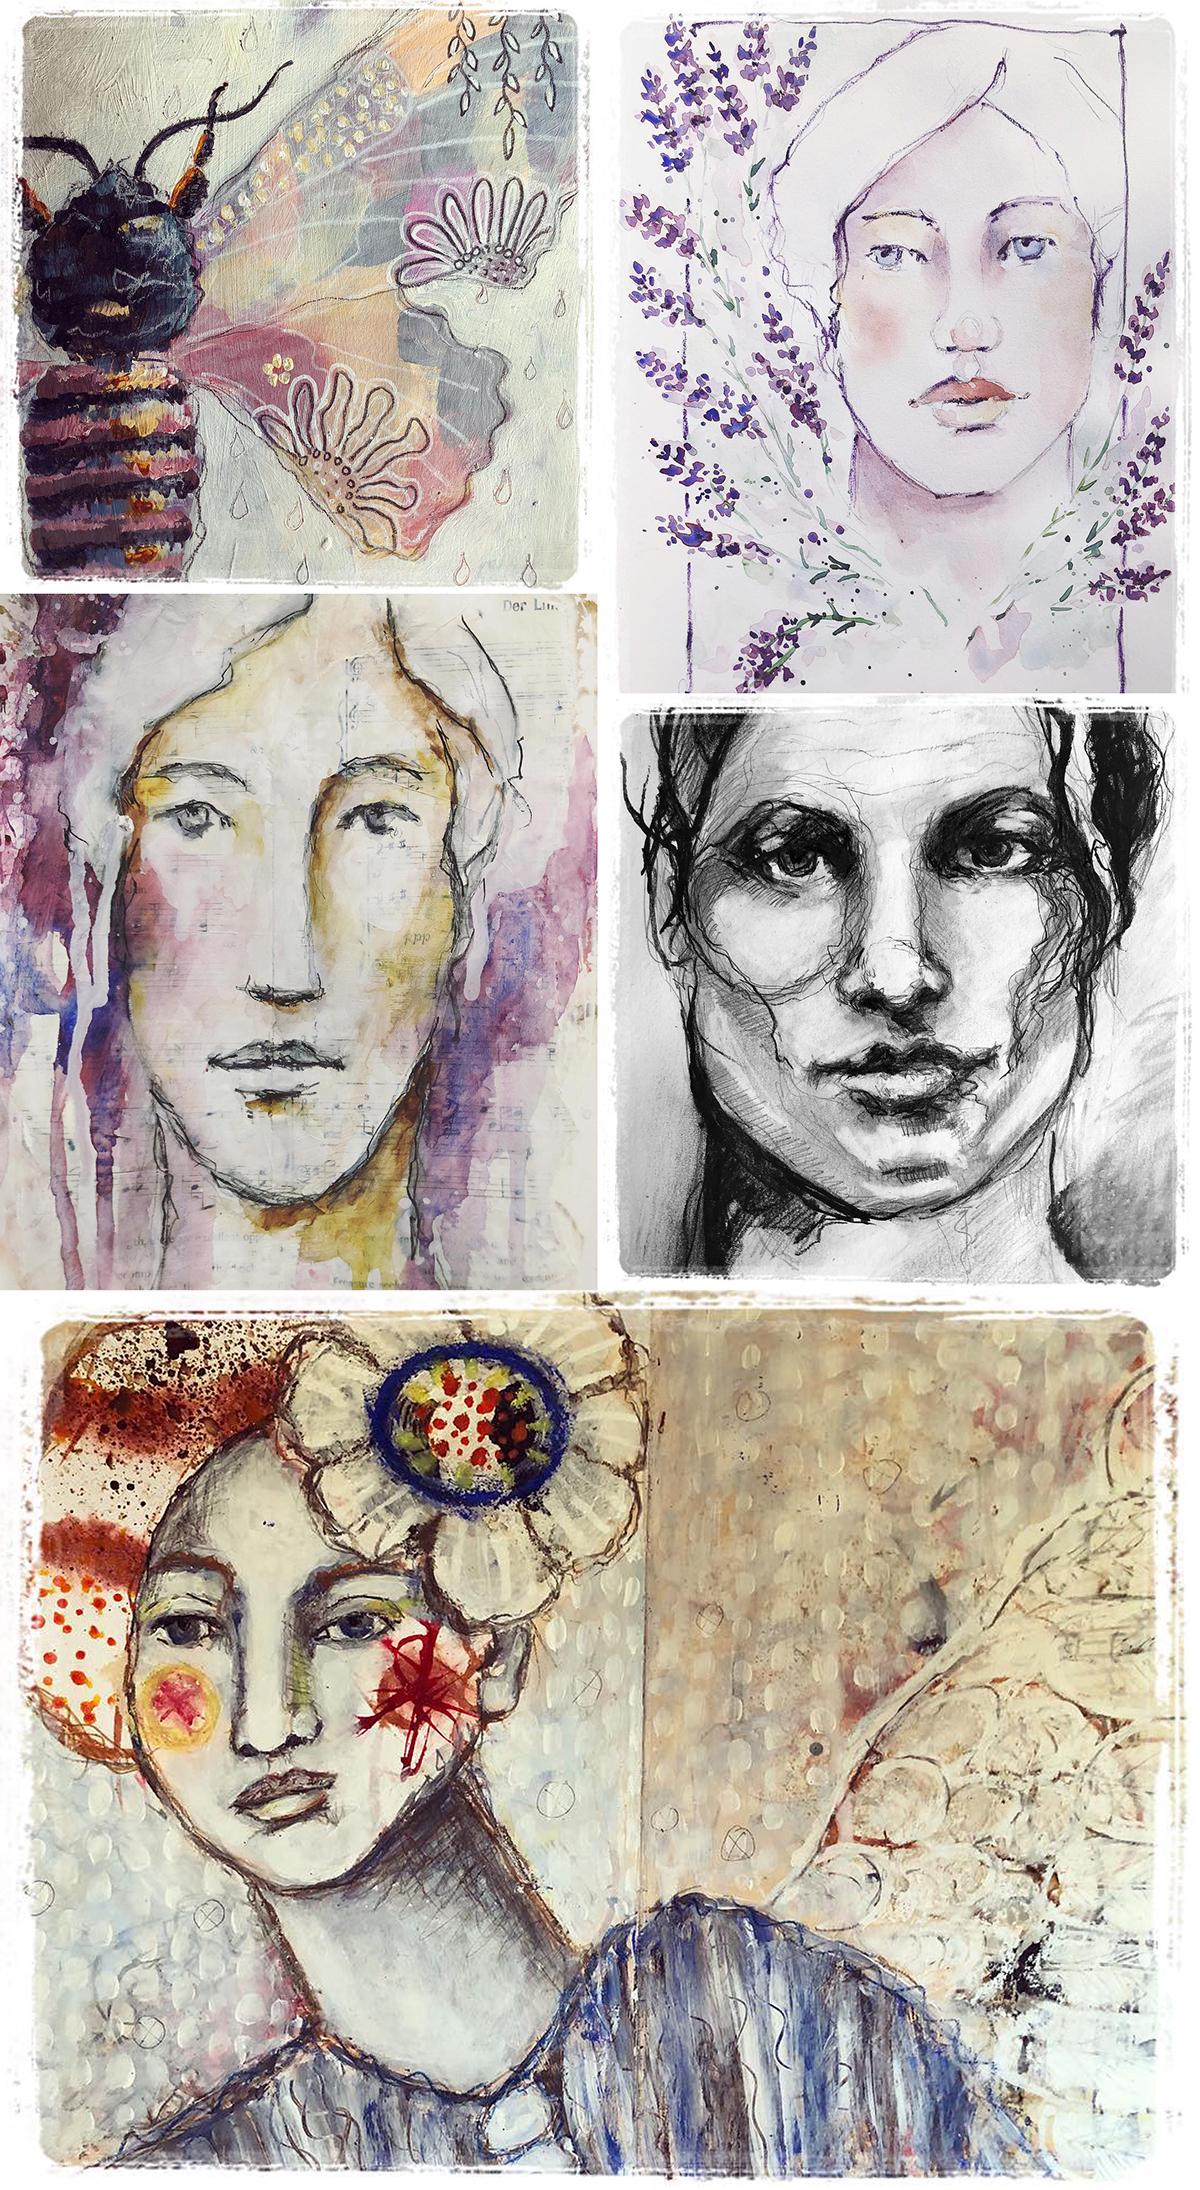 Galia Alena's take on the lessons by Micki Wilde, Andrea Gomoll, Toni Burt, Jeanne-Marie Webb and Mystele Kirkeeng